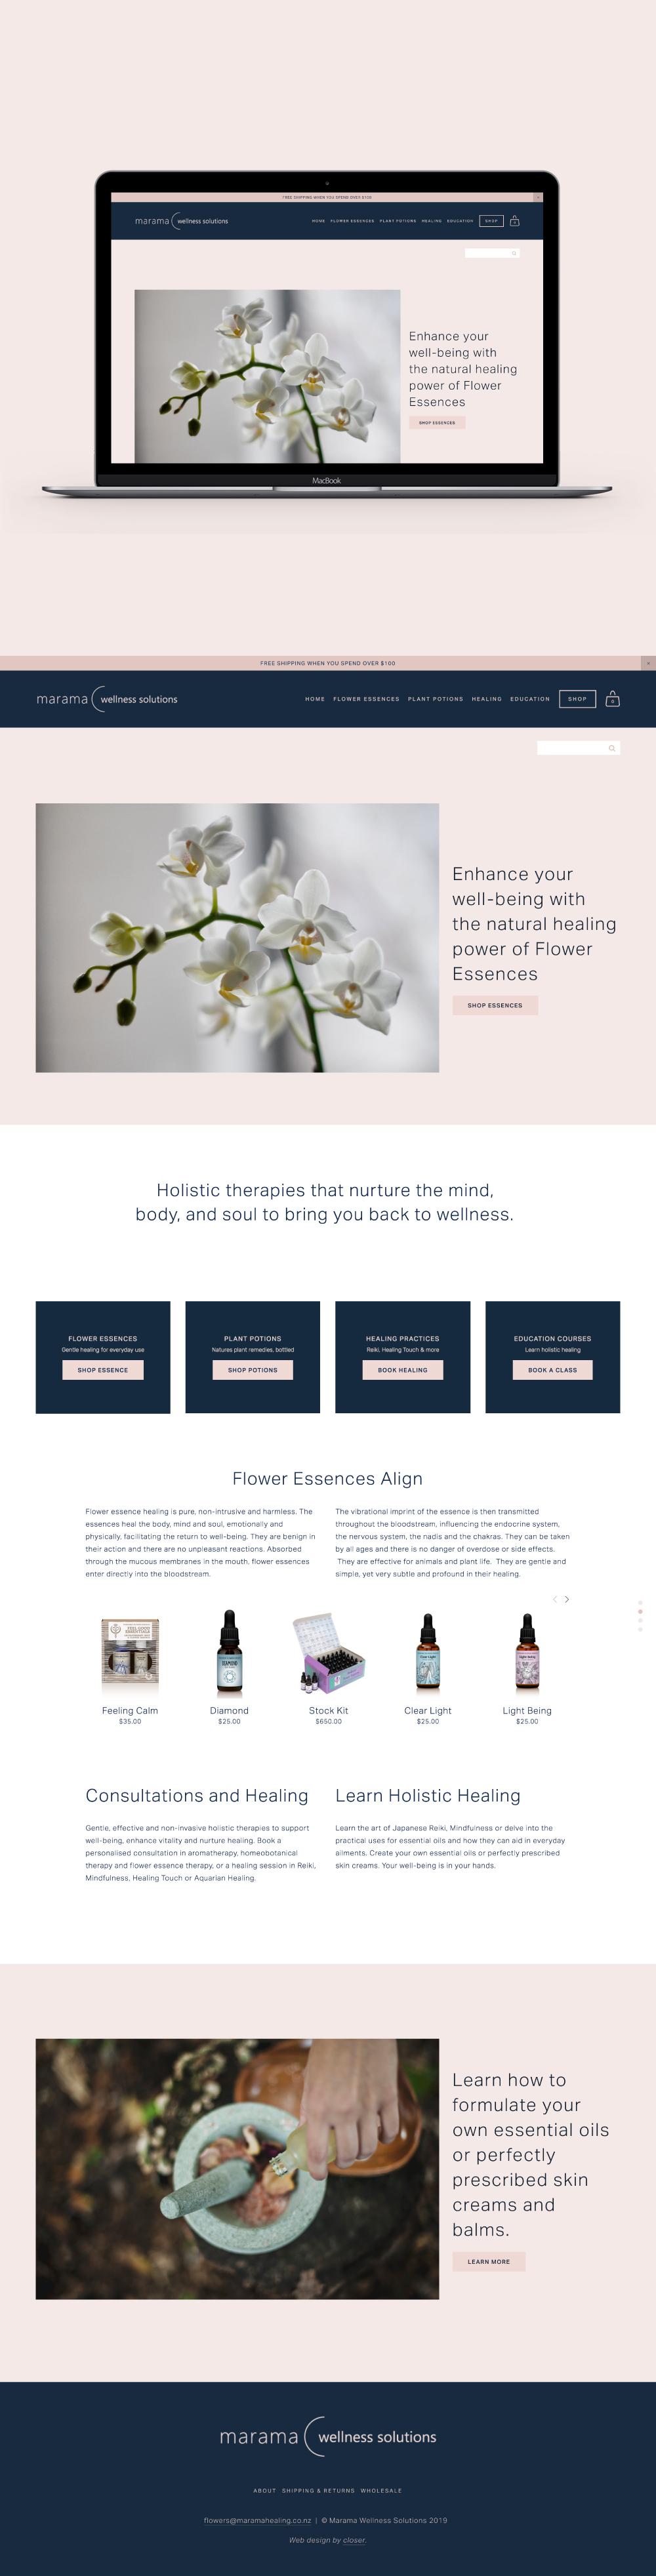 marama-wellness-solutions-custom-ecommerce-website